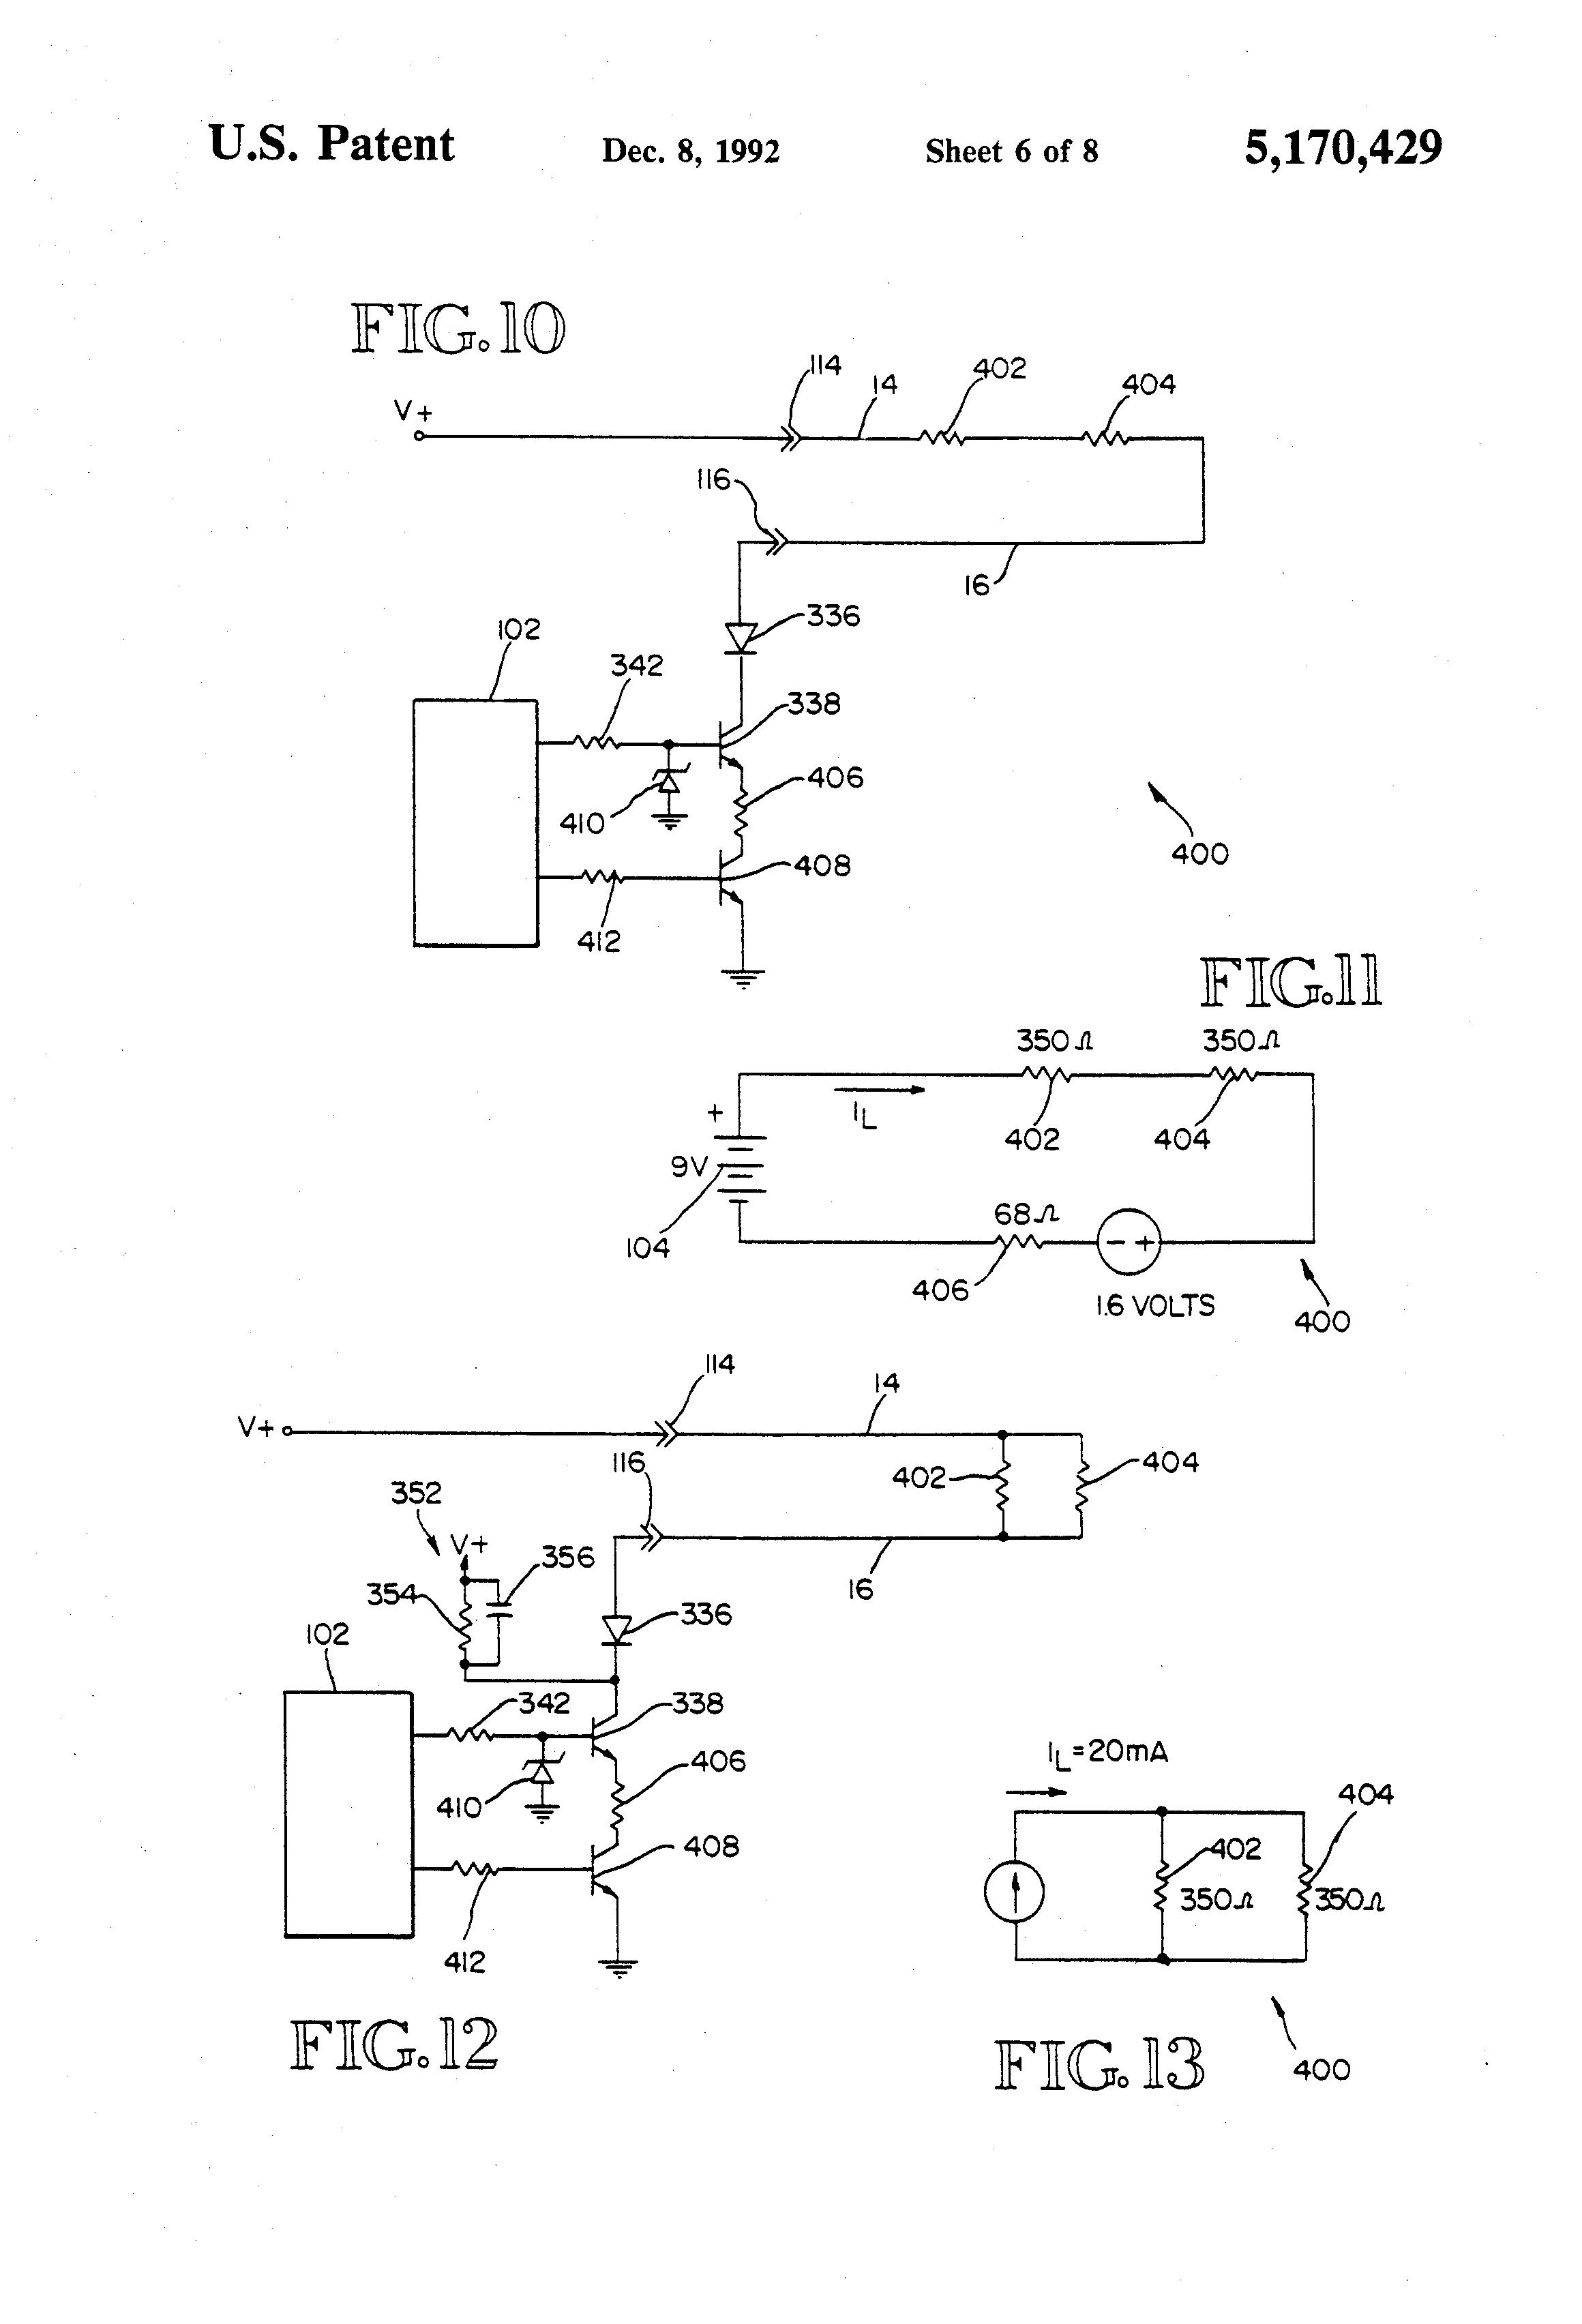 Circuit Schematic Diagram Of Audible Logic Probe